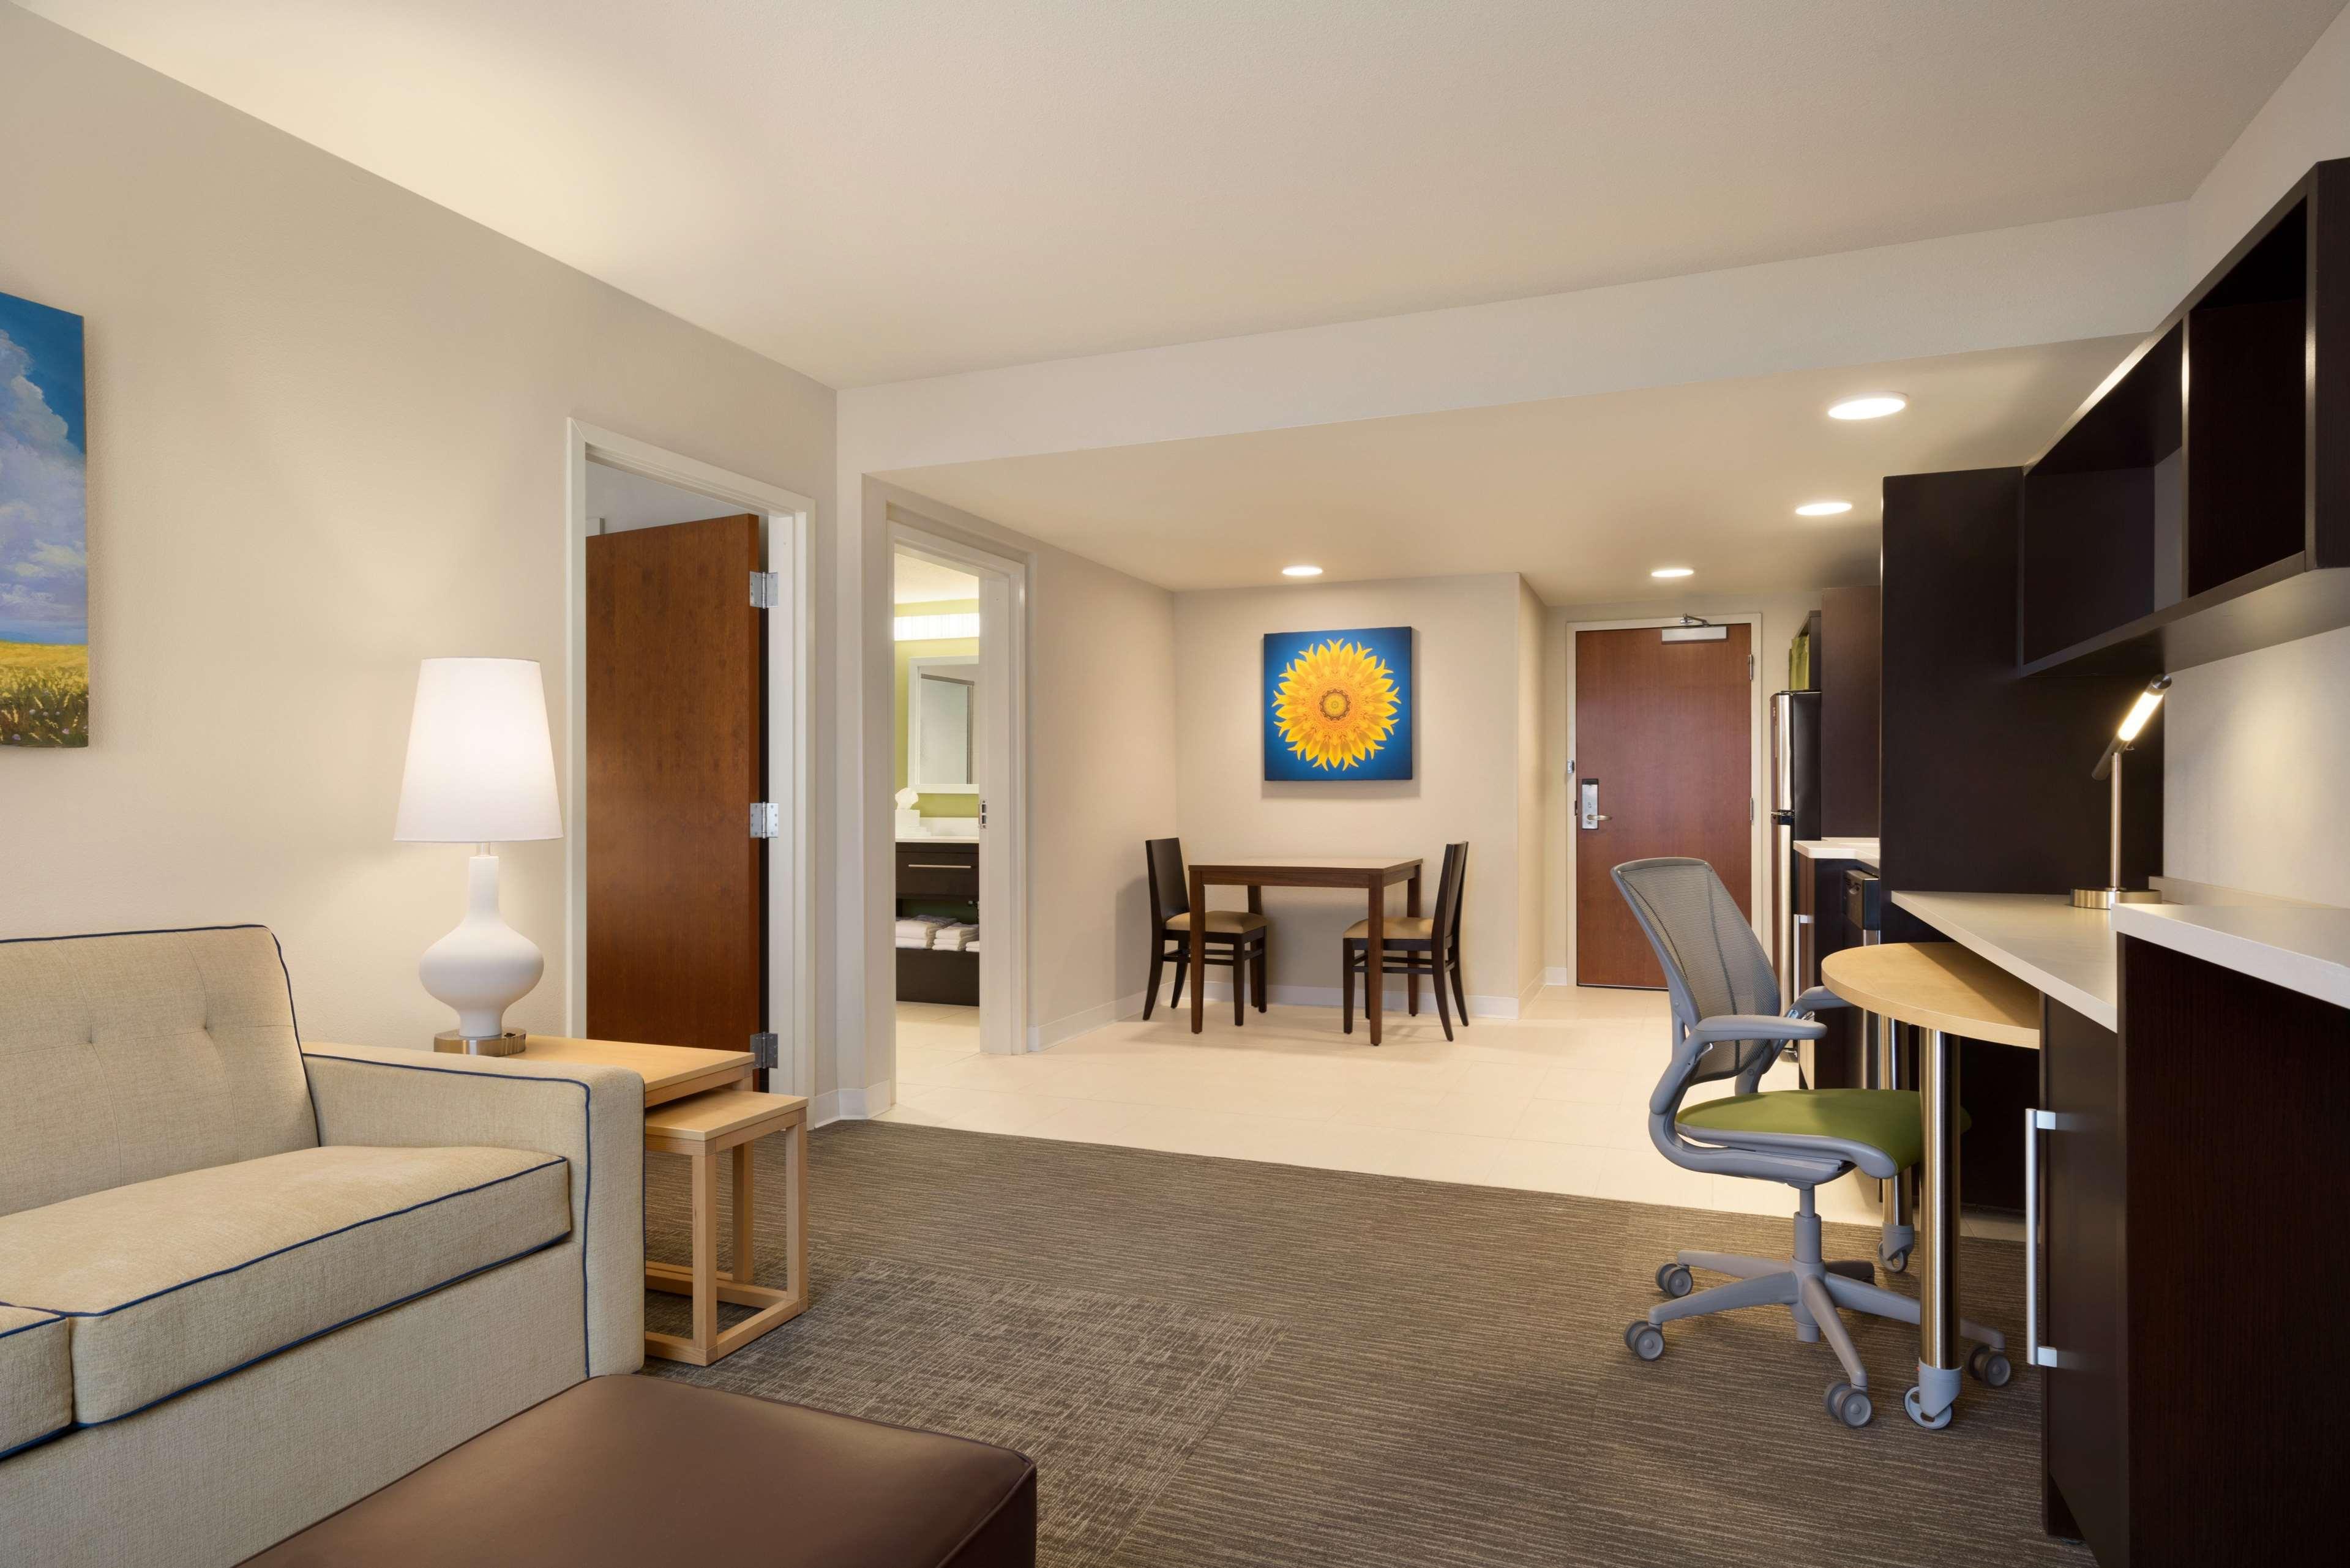 Home2 Suites by Hilton Leavenworth Downtown image 37